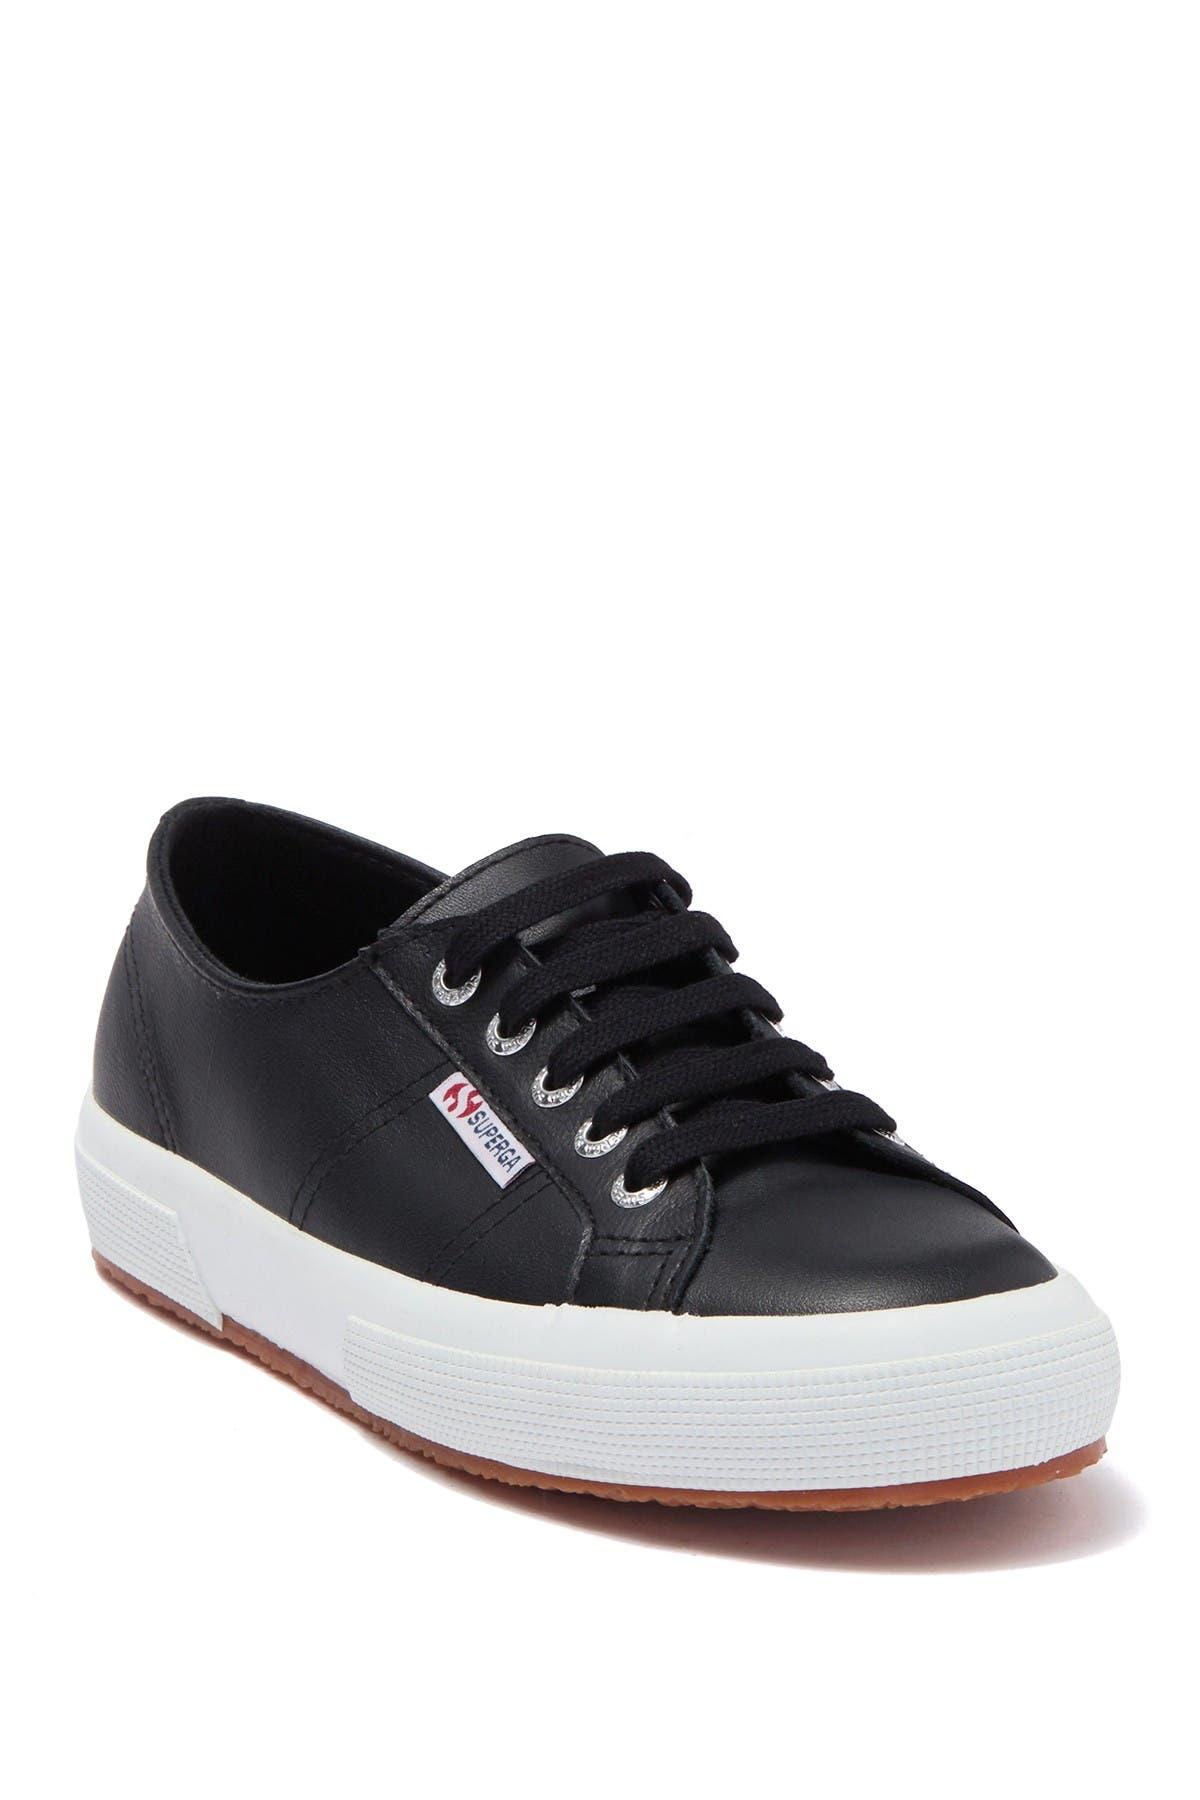 Superga | 2750 Leather Sneaker